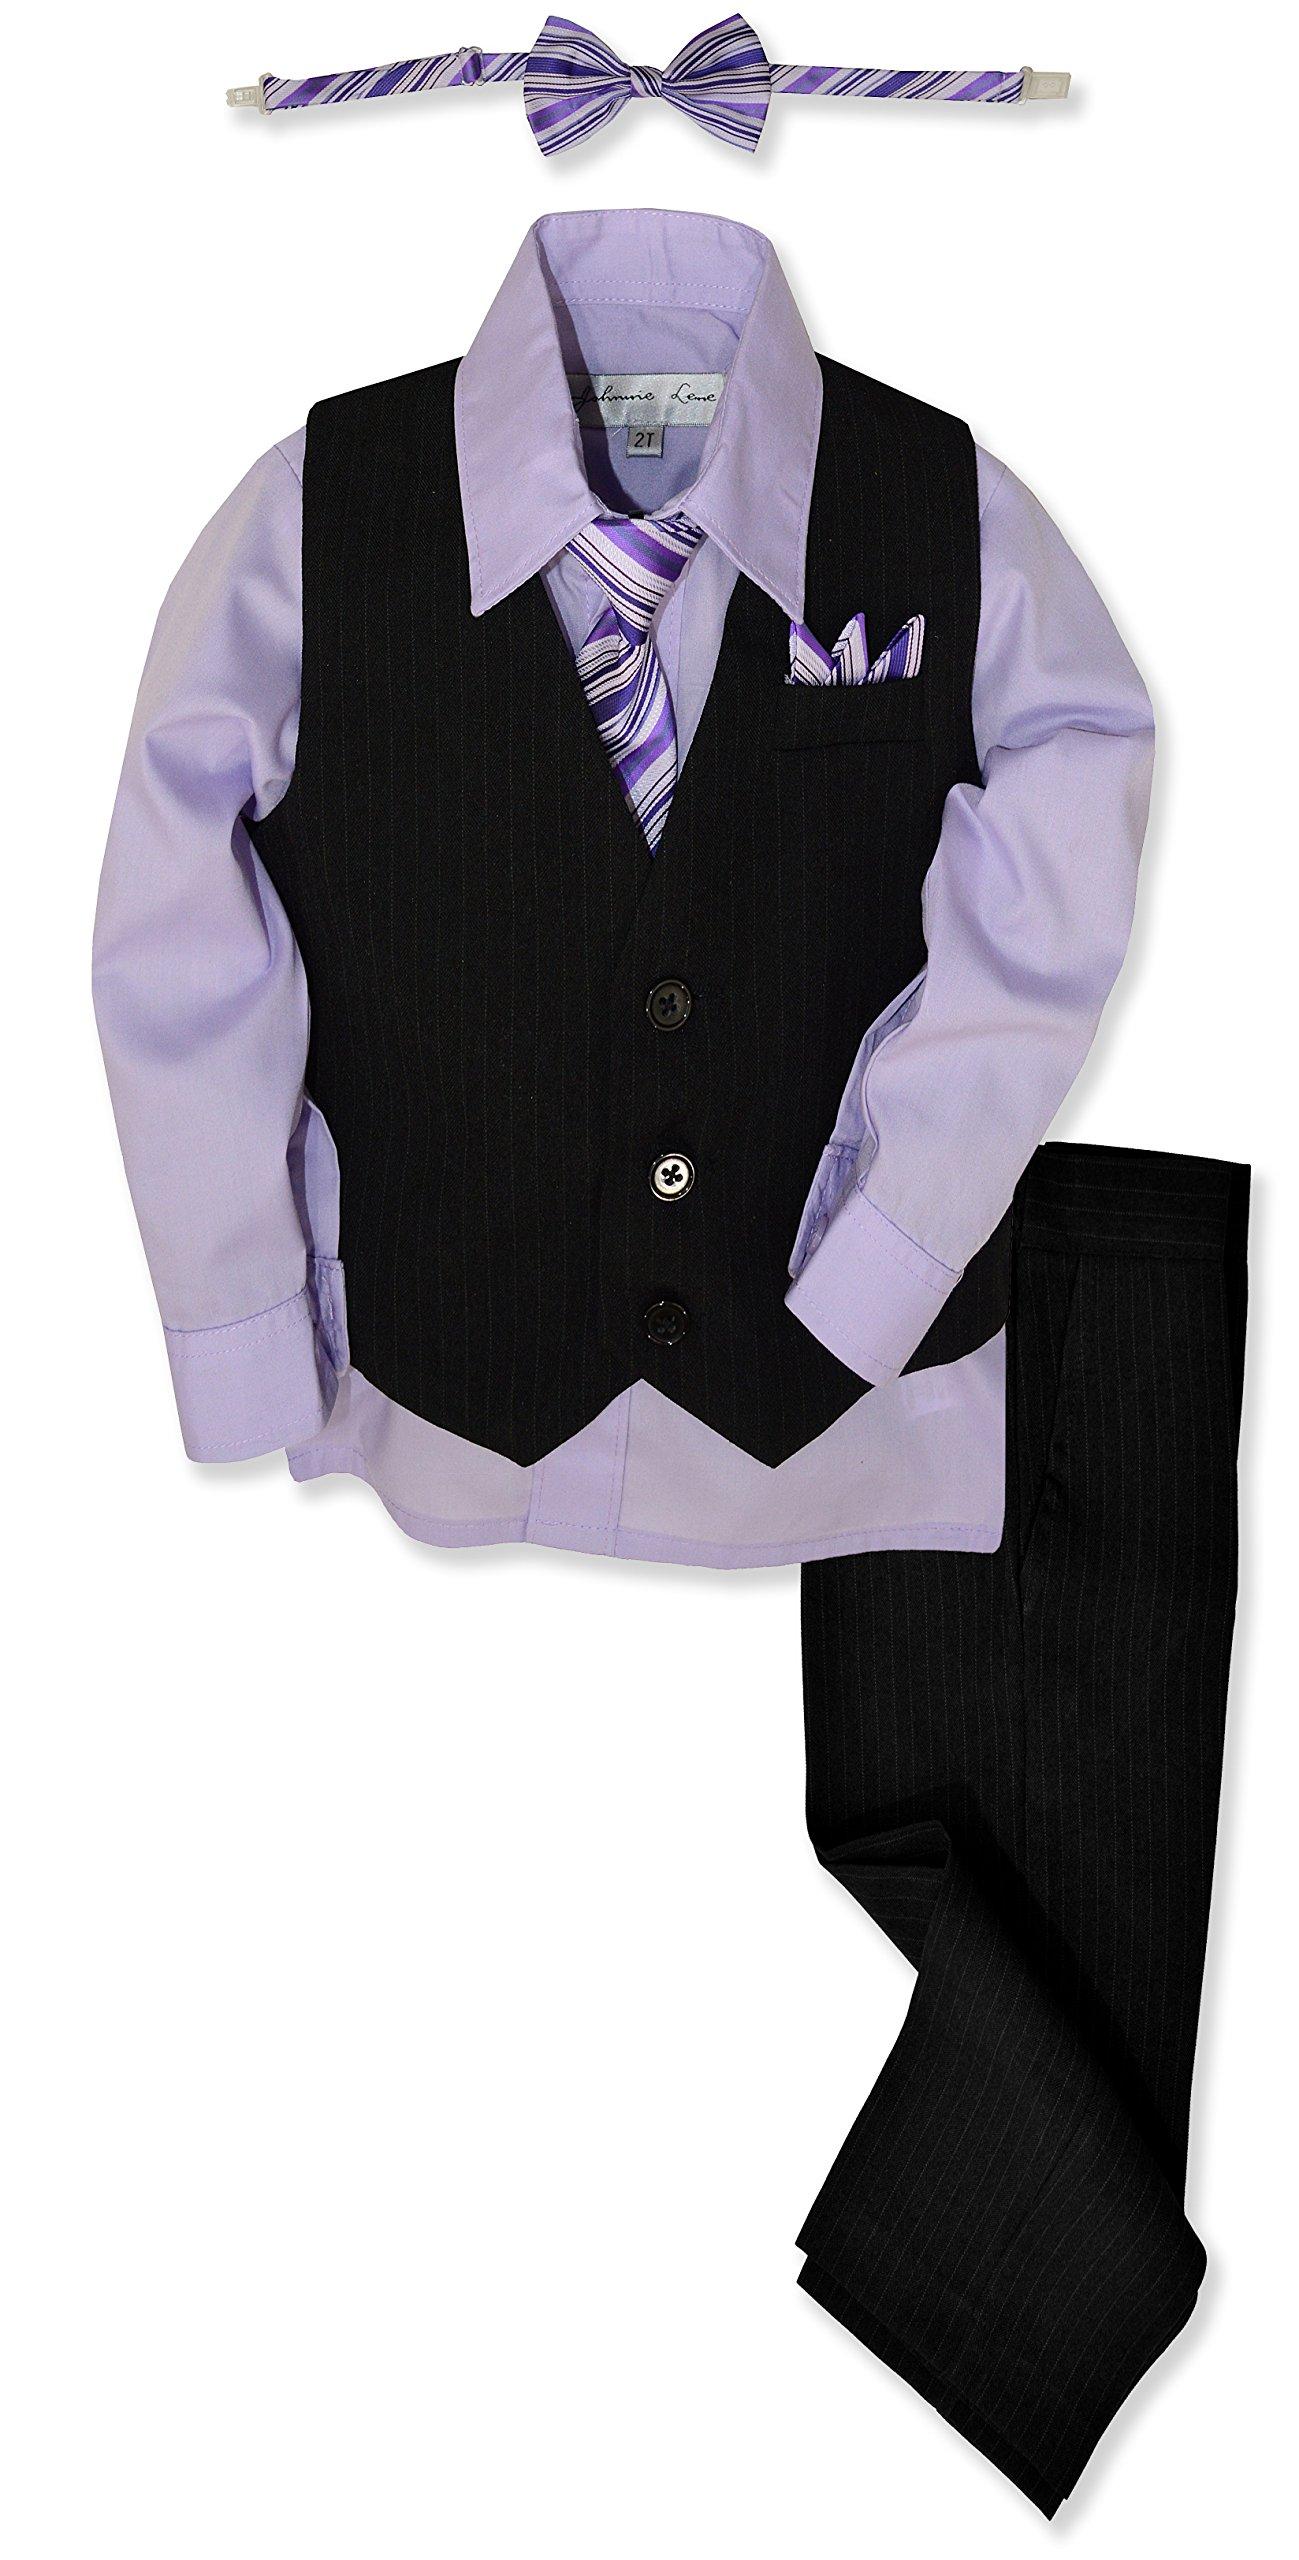 Johnnie Lene JL40 Pinstripe Boys Formal Dresswear Vest Set (3T, Black/Lilac)